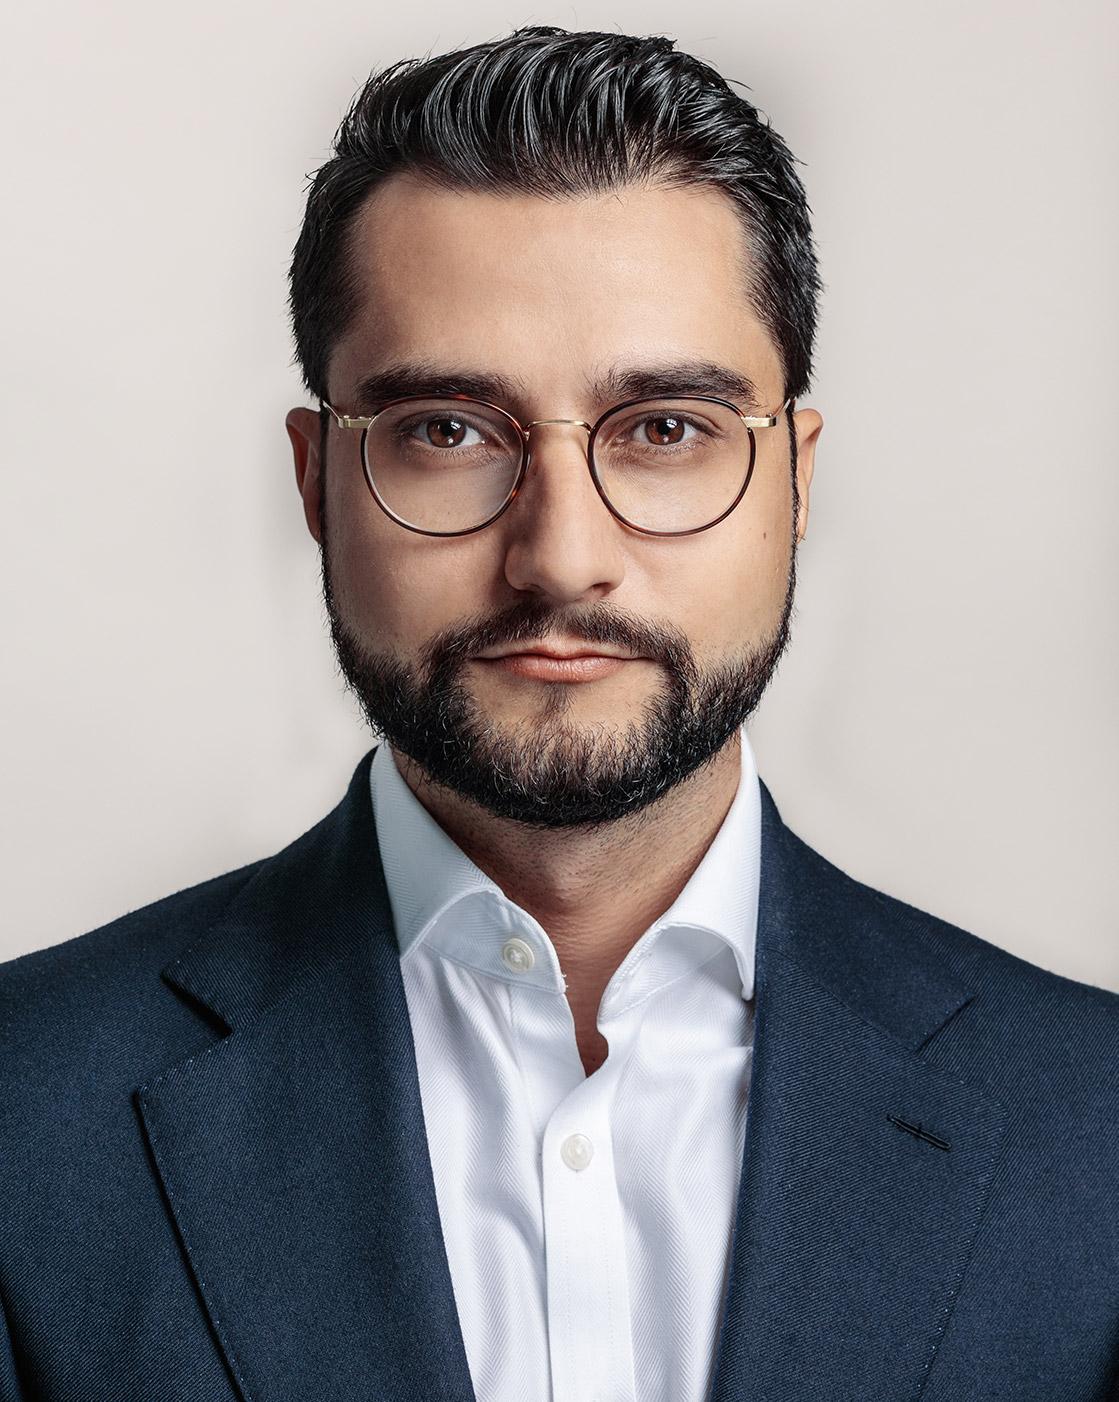 Kurosch Daniel Habibi